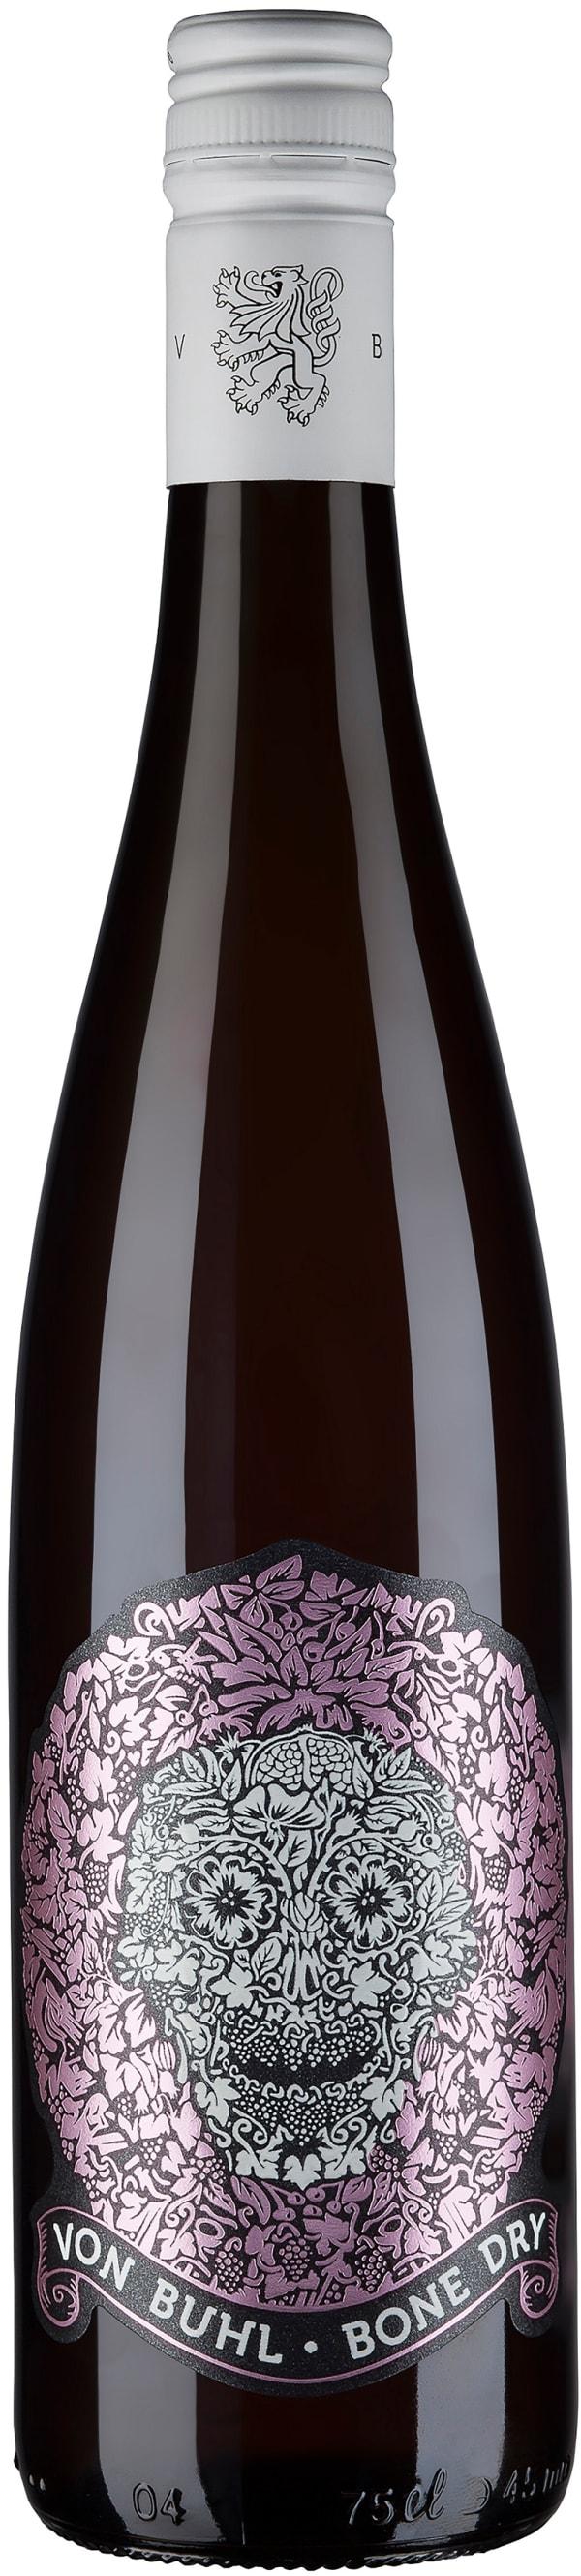 Von Buhl Bone Dry Rosé 2017